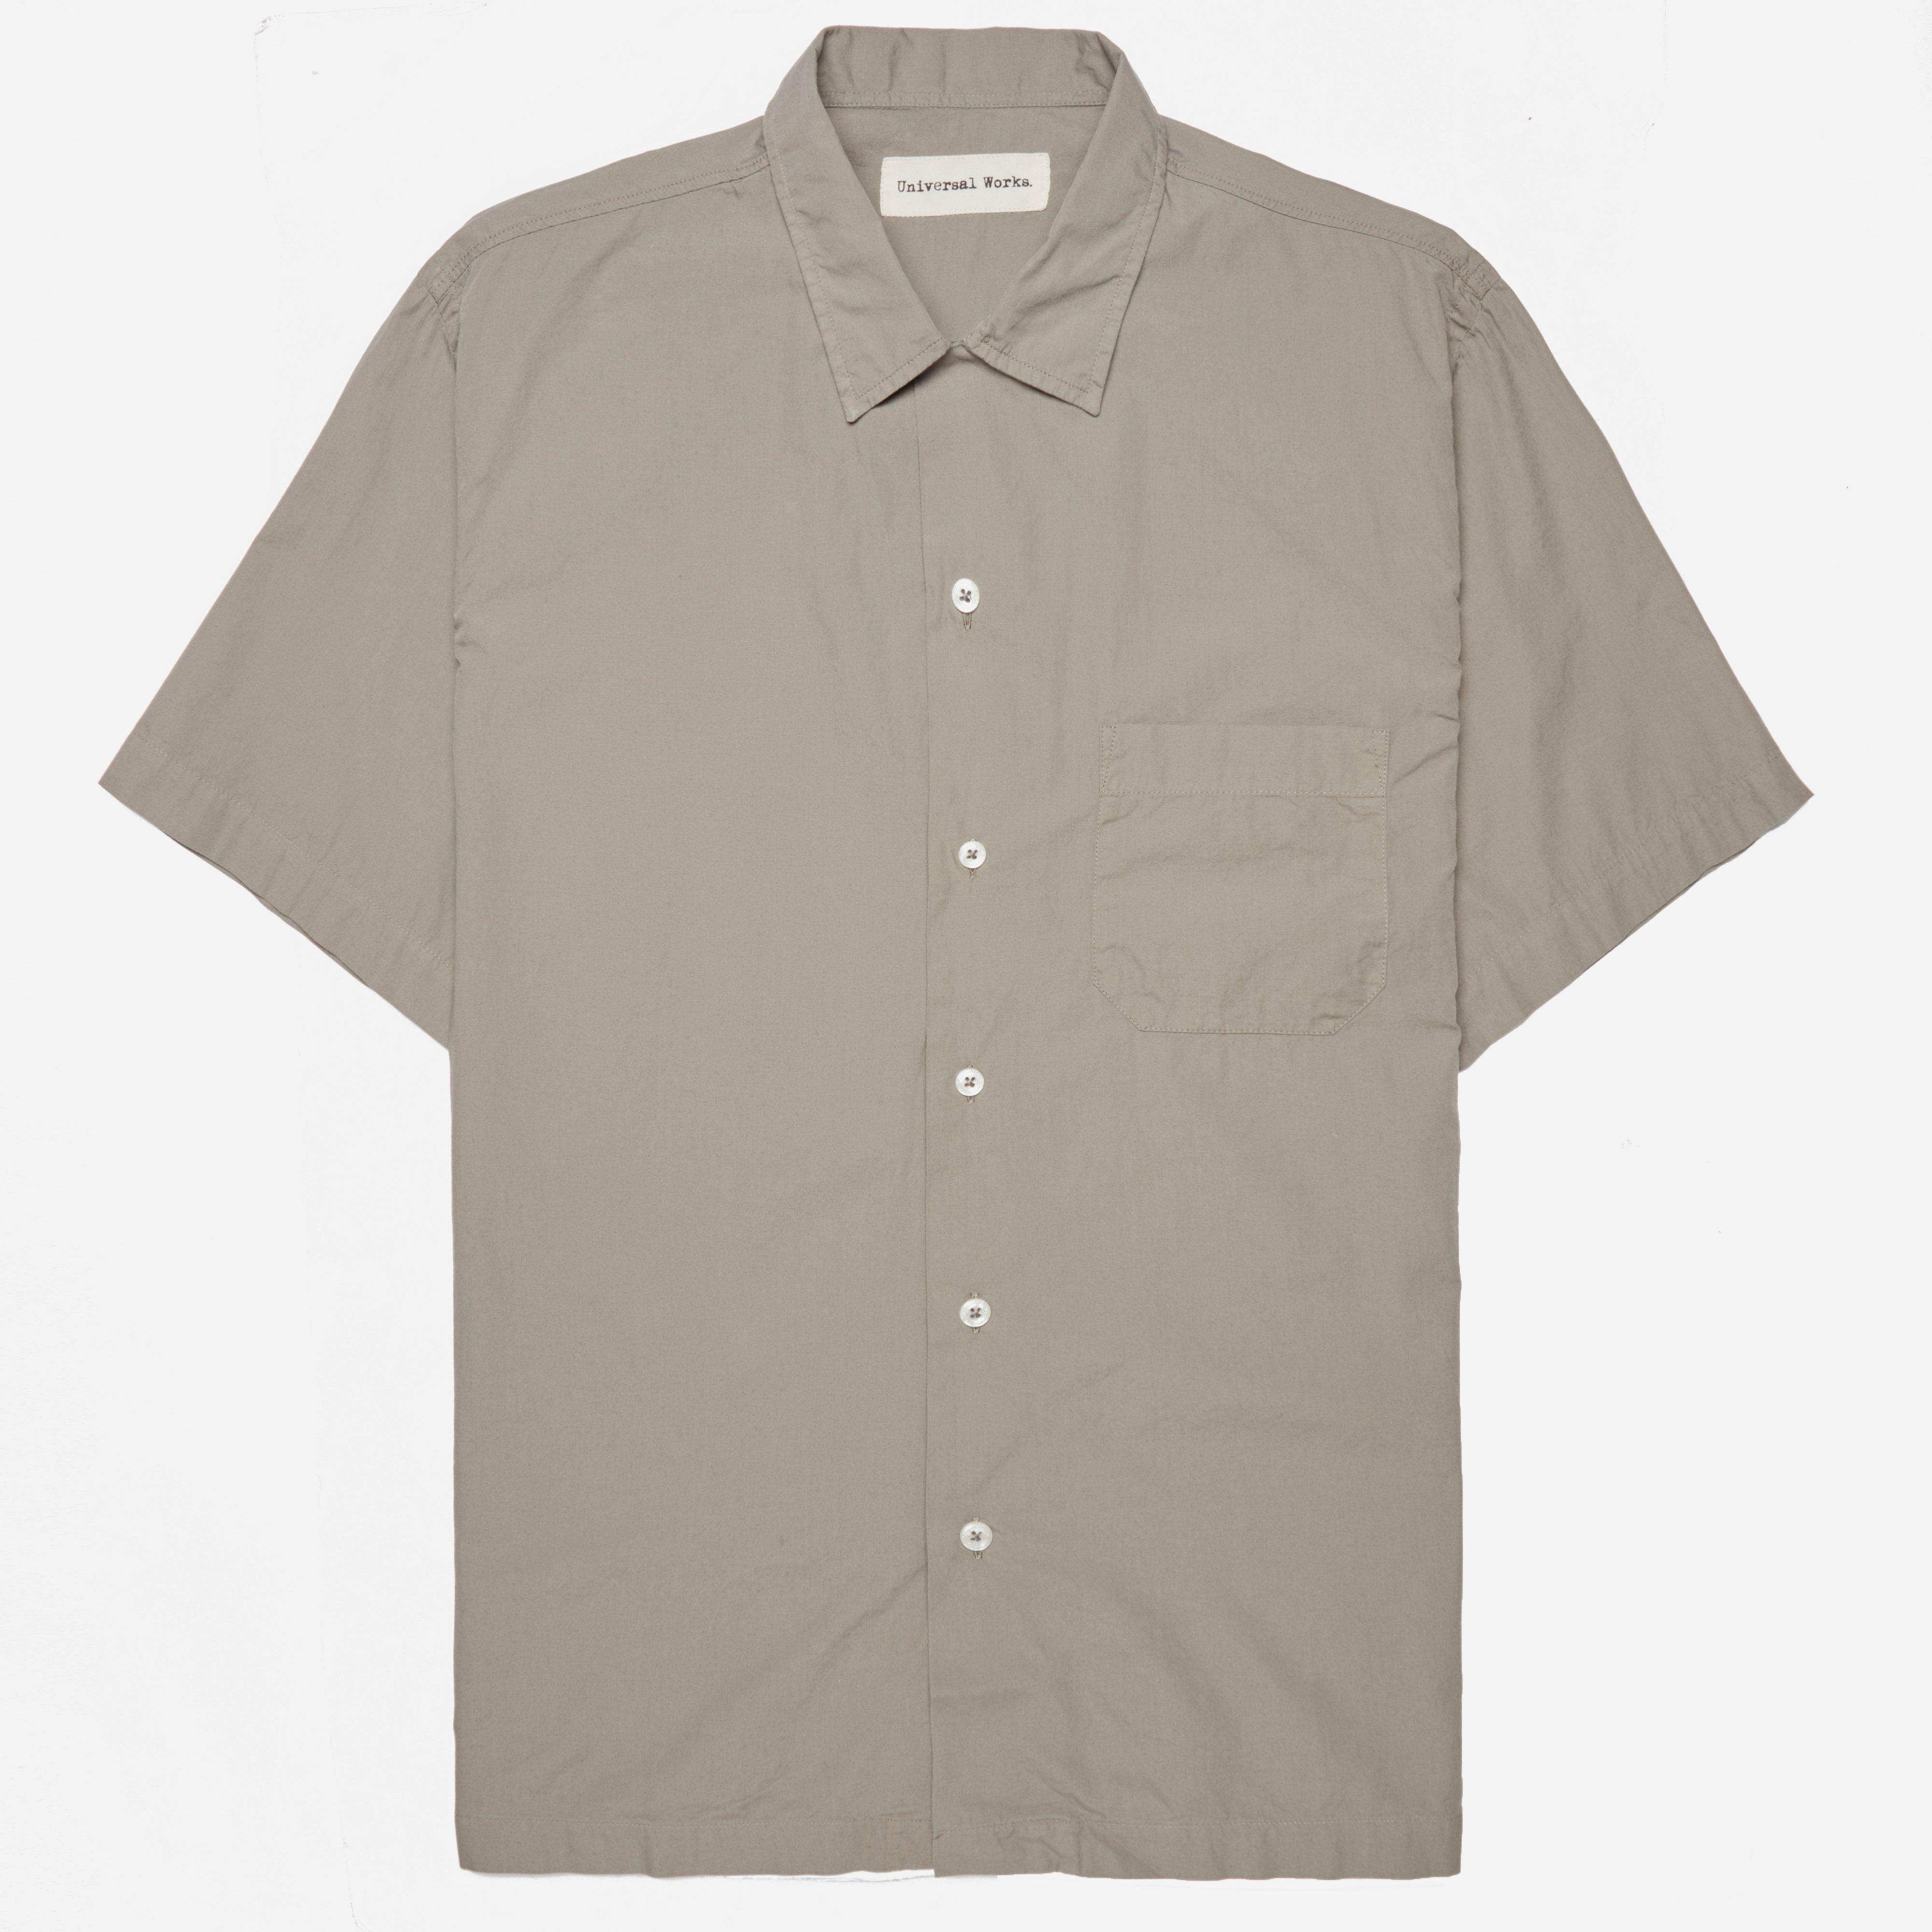 Universal Works Poplin Road Shirt